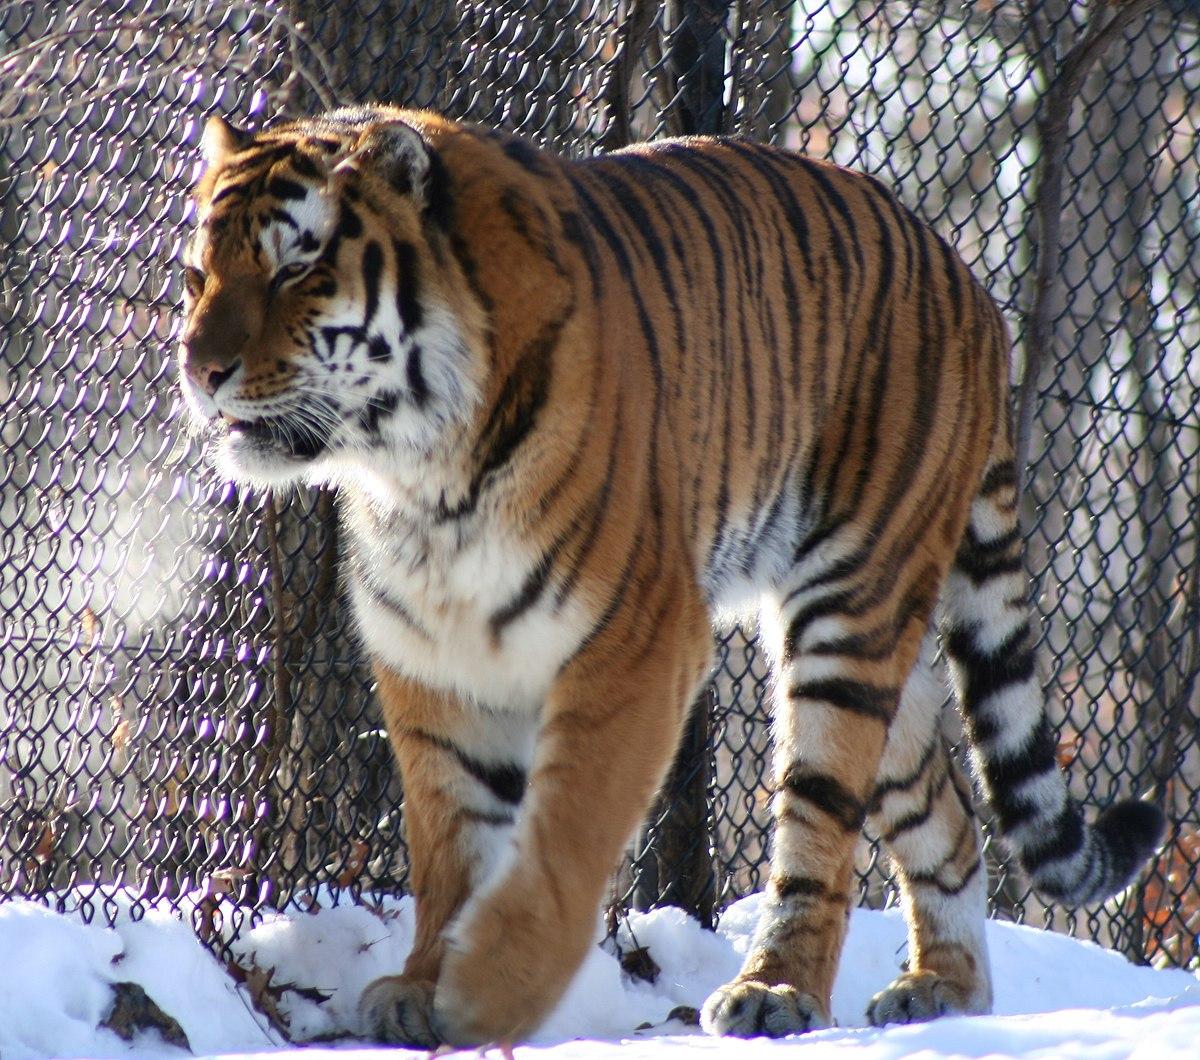 White Tiger Wallpaper Hd 1080p Minnesota Zoo Wikipedia